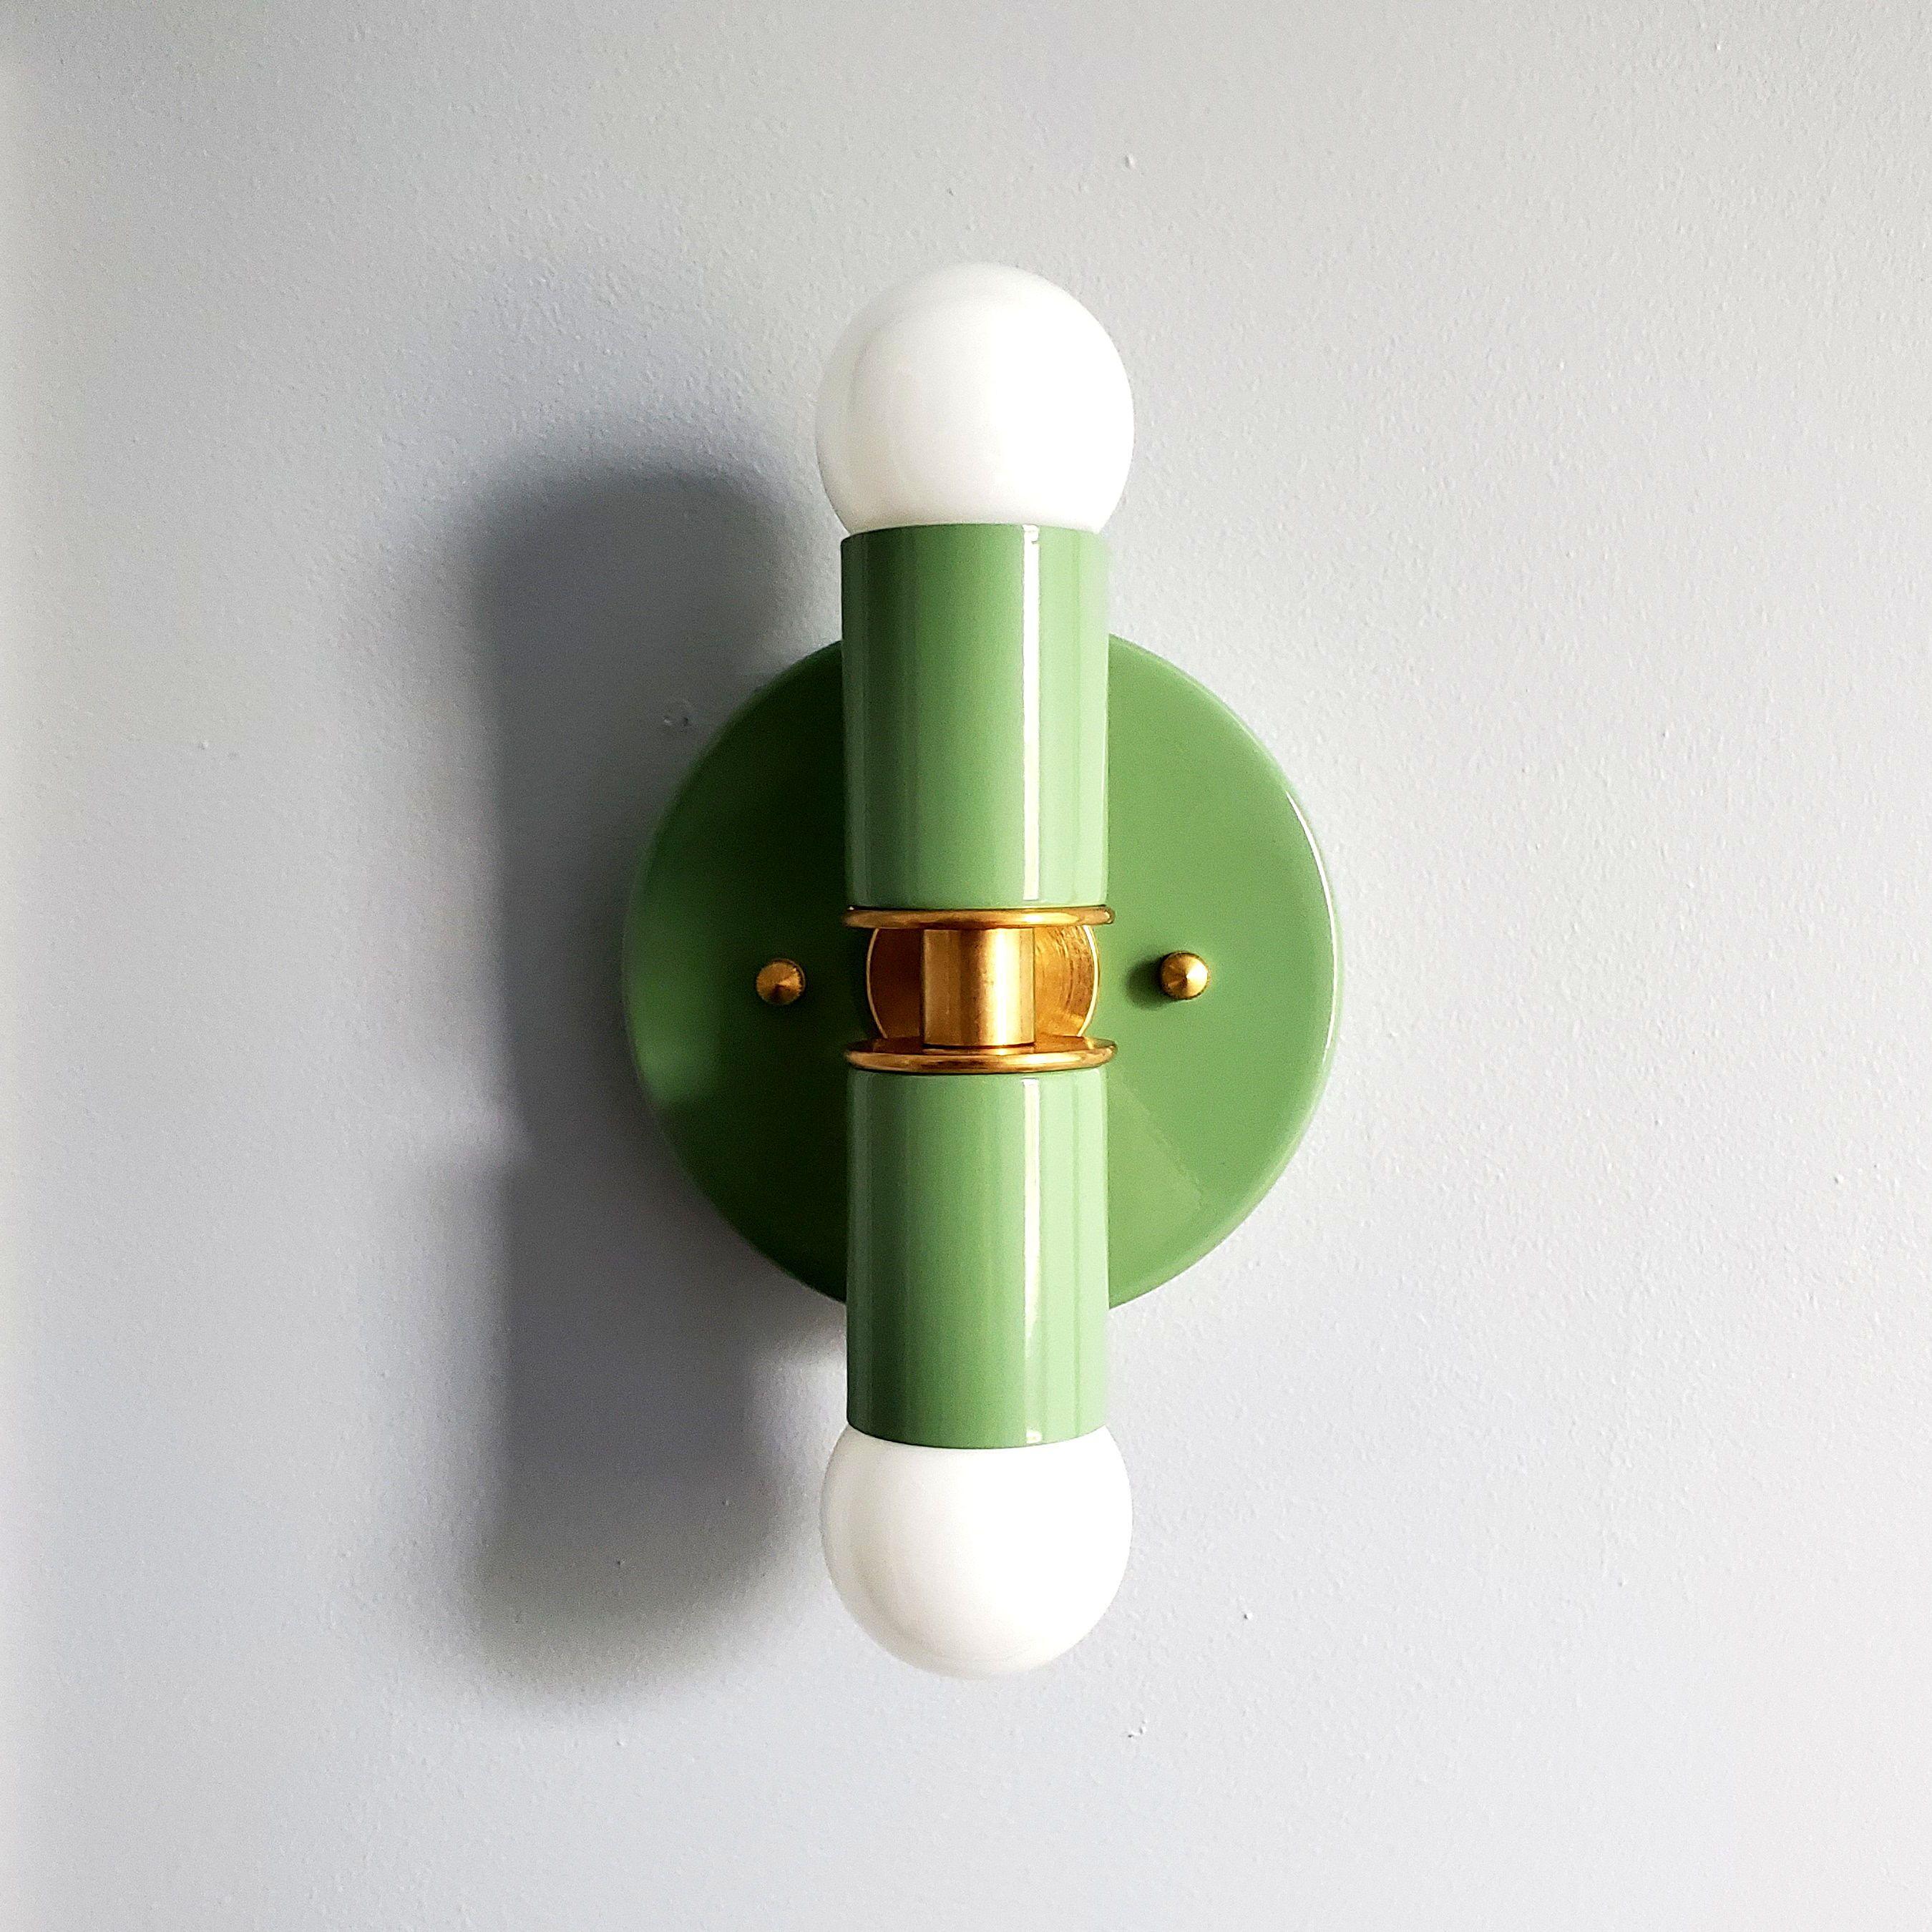 Monochrome Green And Brass Mid Century Modern Lighting Design In 2020 Mid Century Modern Lighting Sconce Lighting Modern Lighting Design